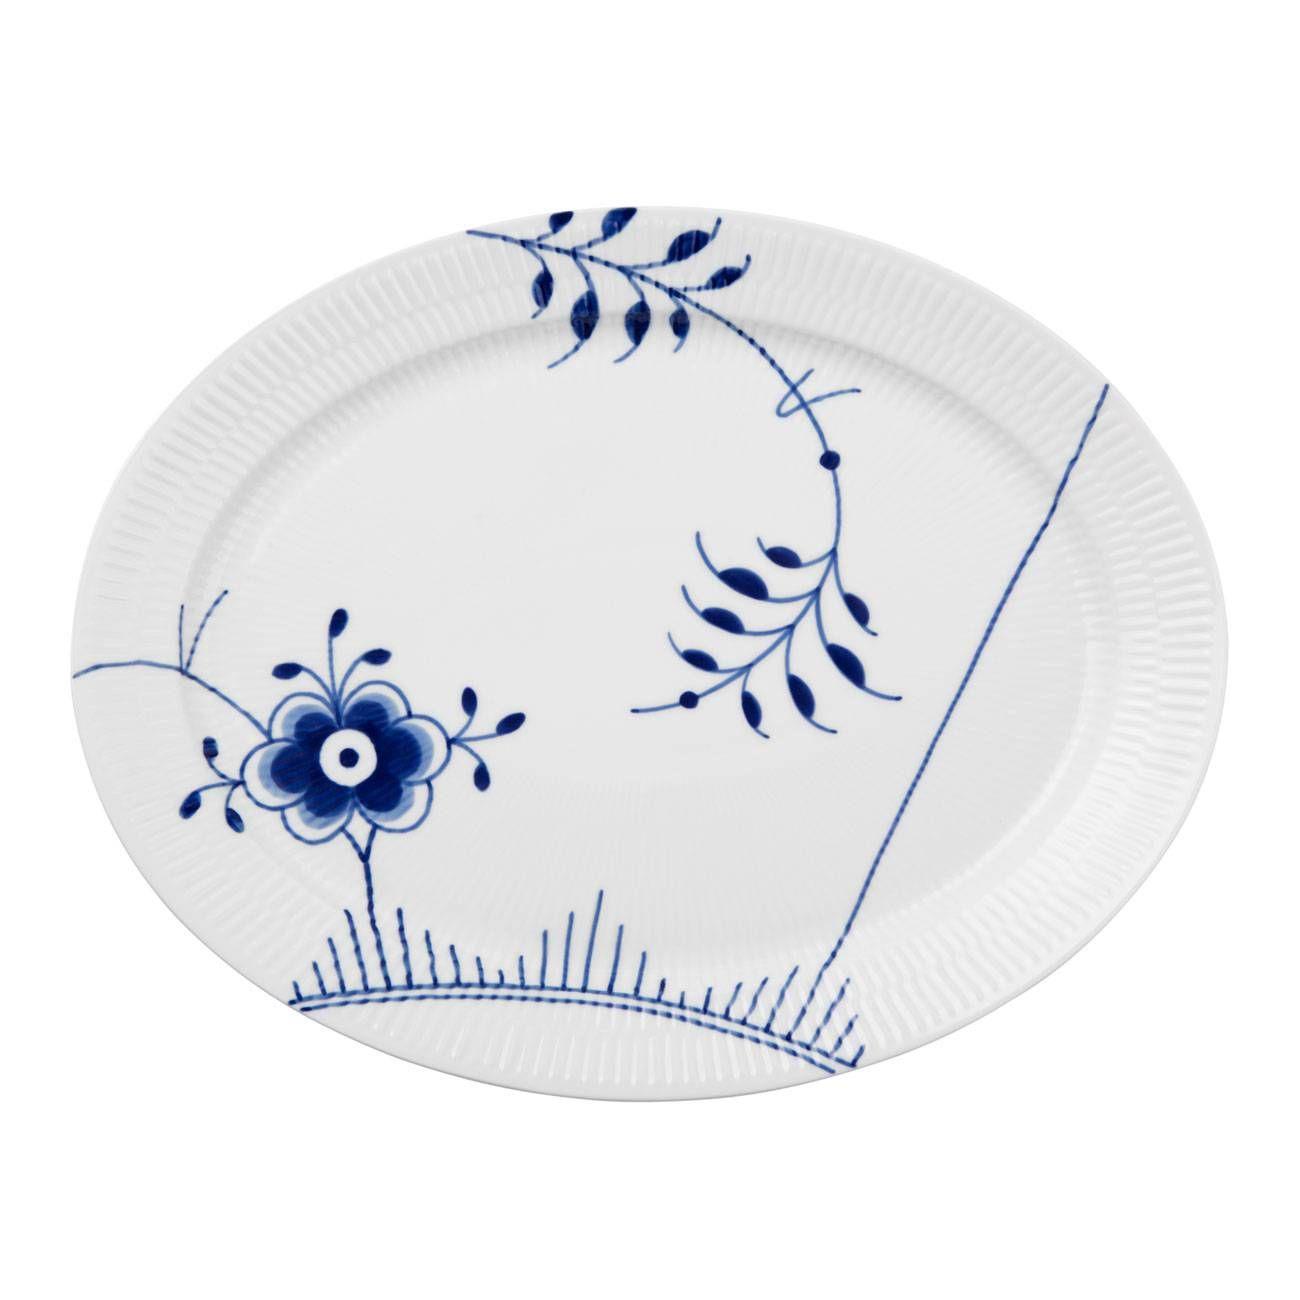 Royal Copenhagen Blue Fluted Mega Oval Platter #2 In 2019